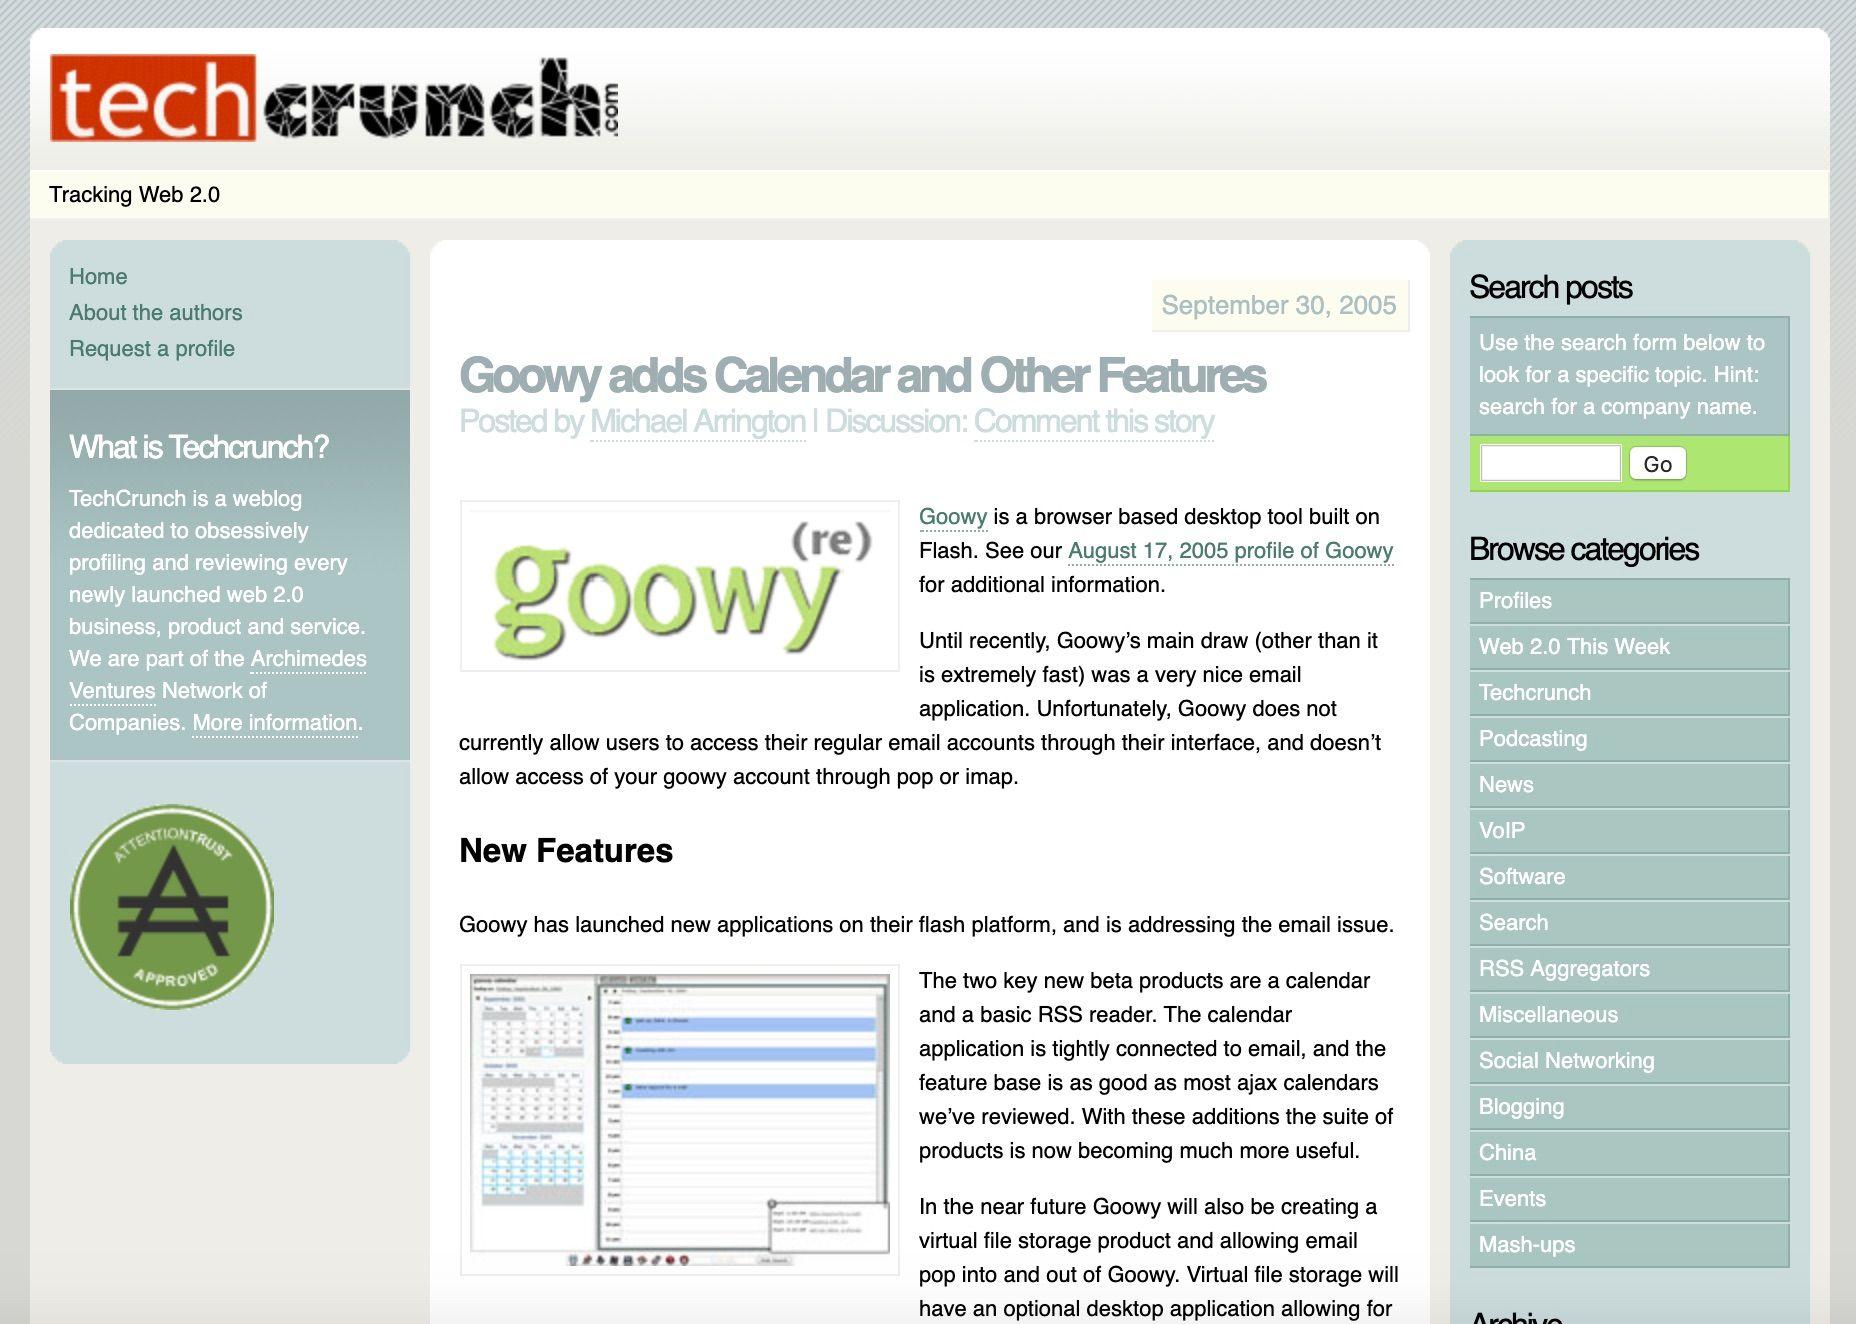 TechCrunch, 2005